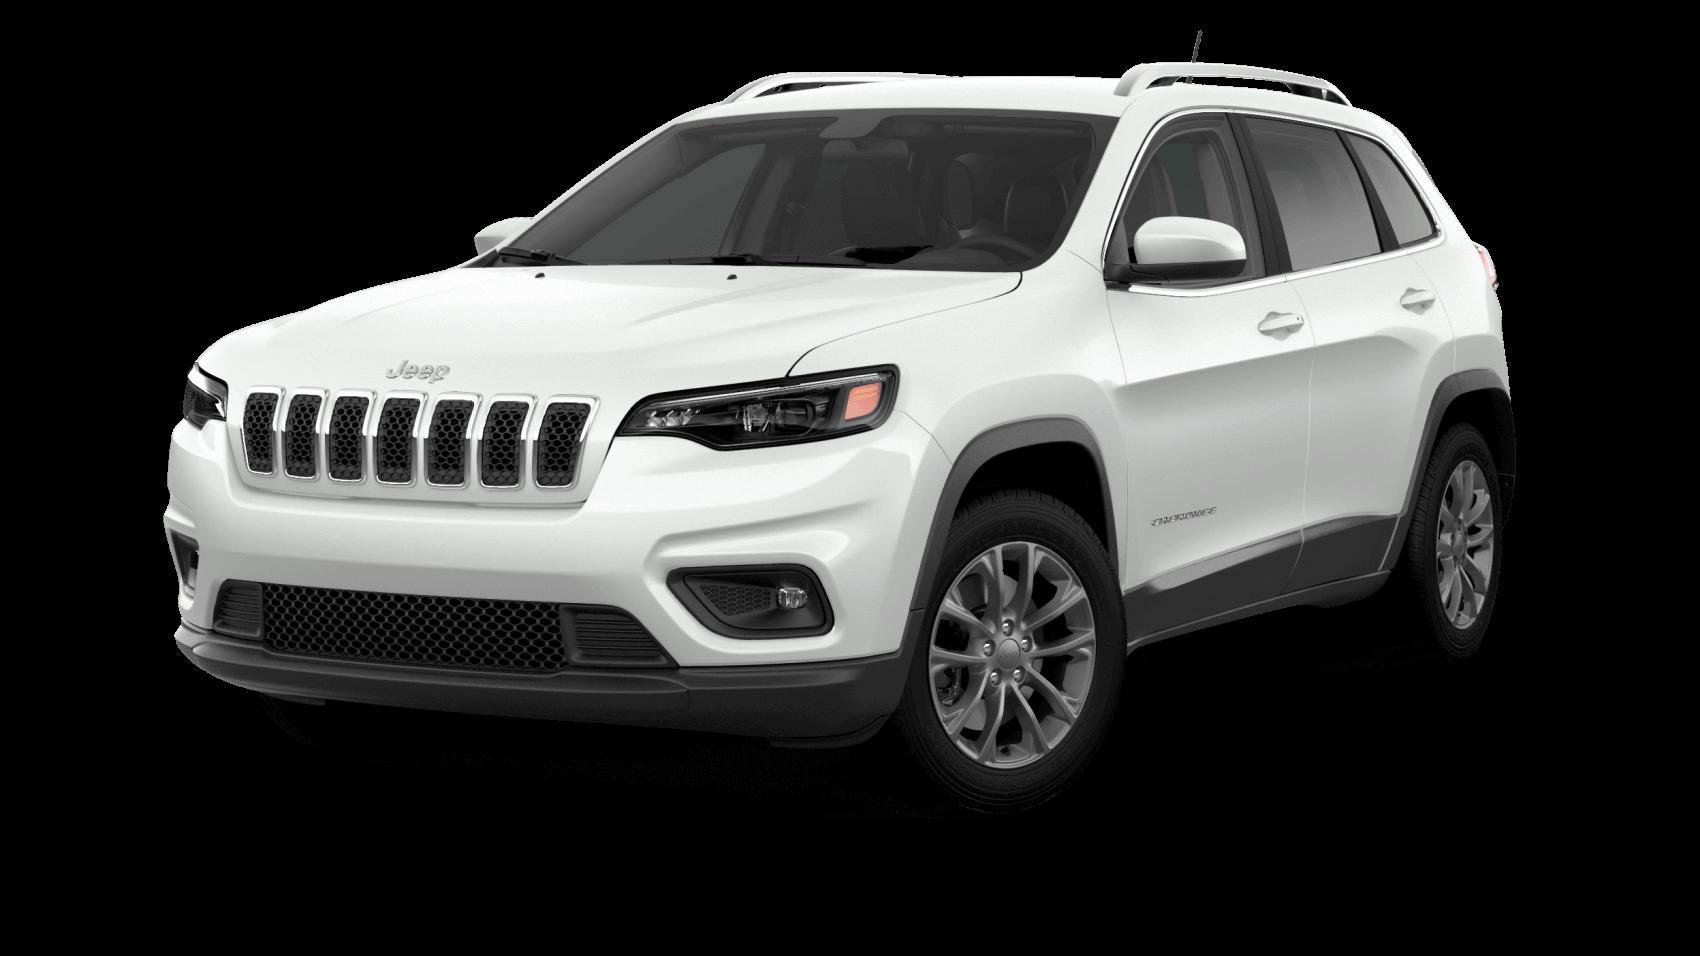 2021 Jeep Cherokee White Findlay CDJR